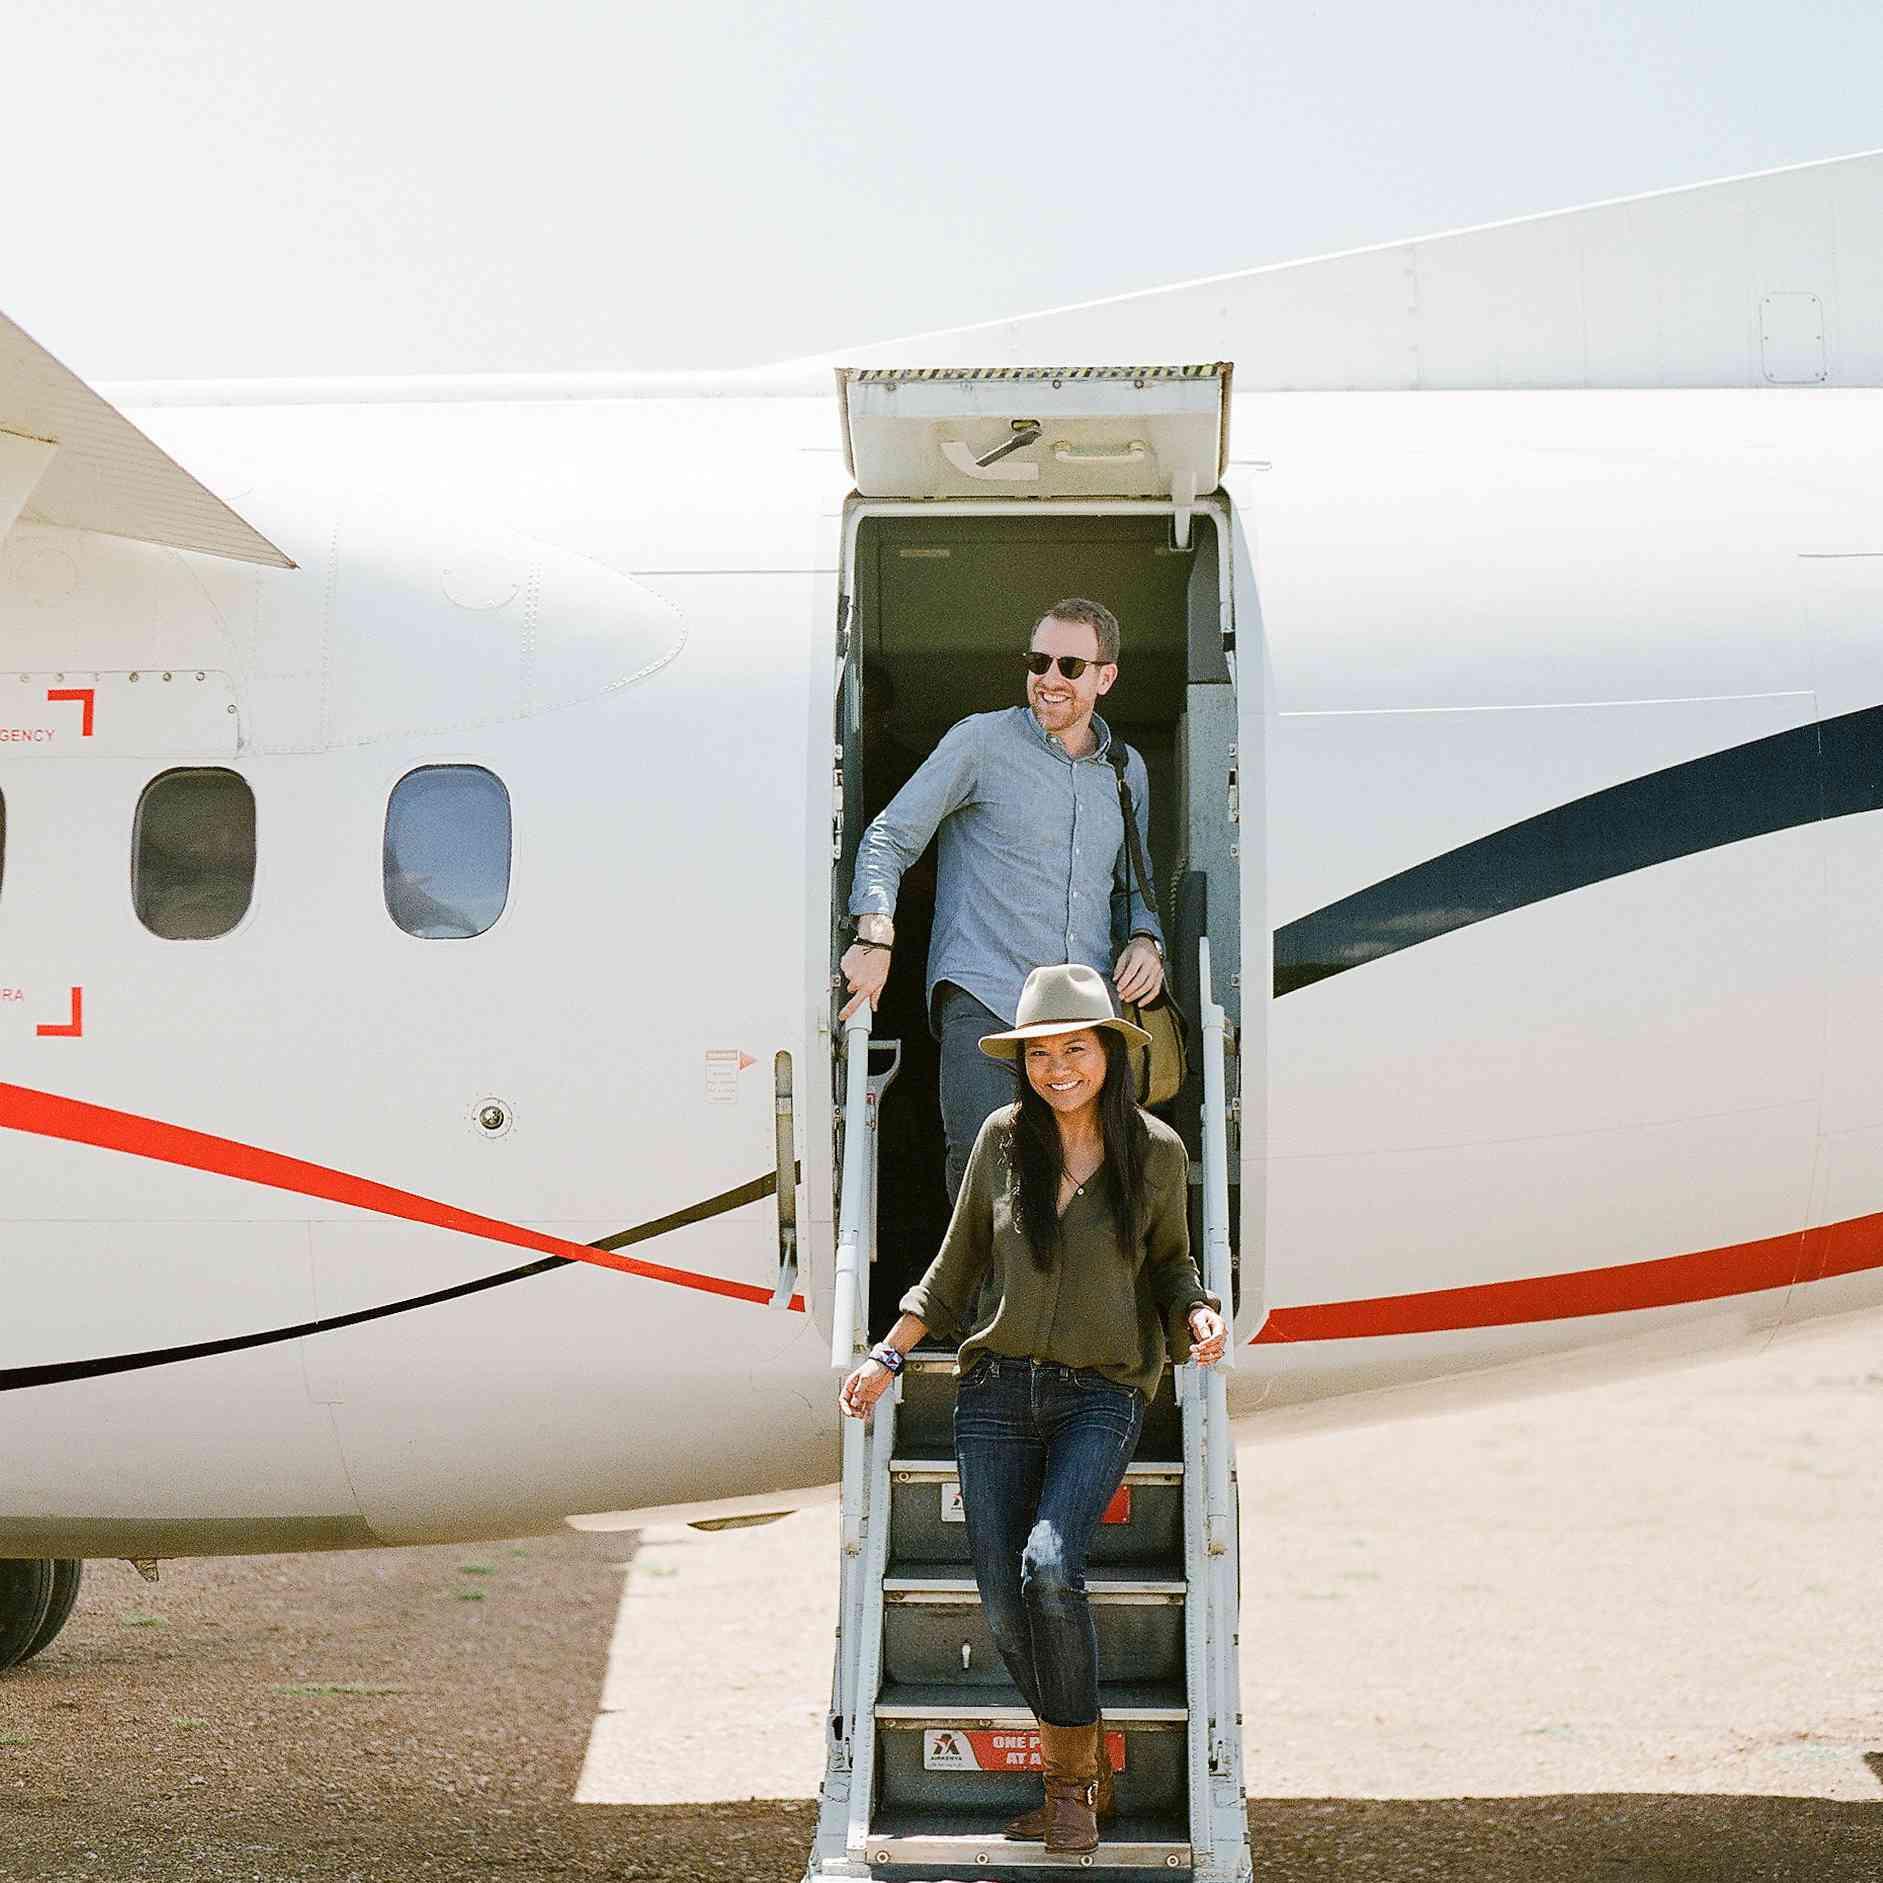 couple on plane